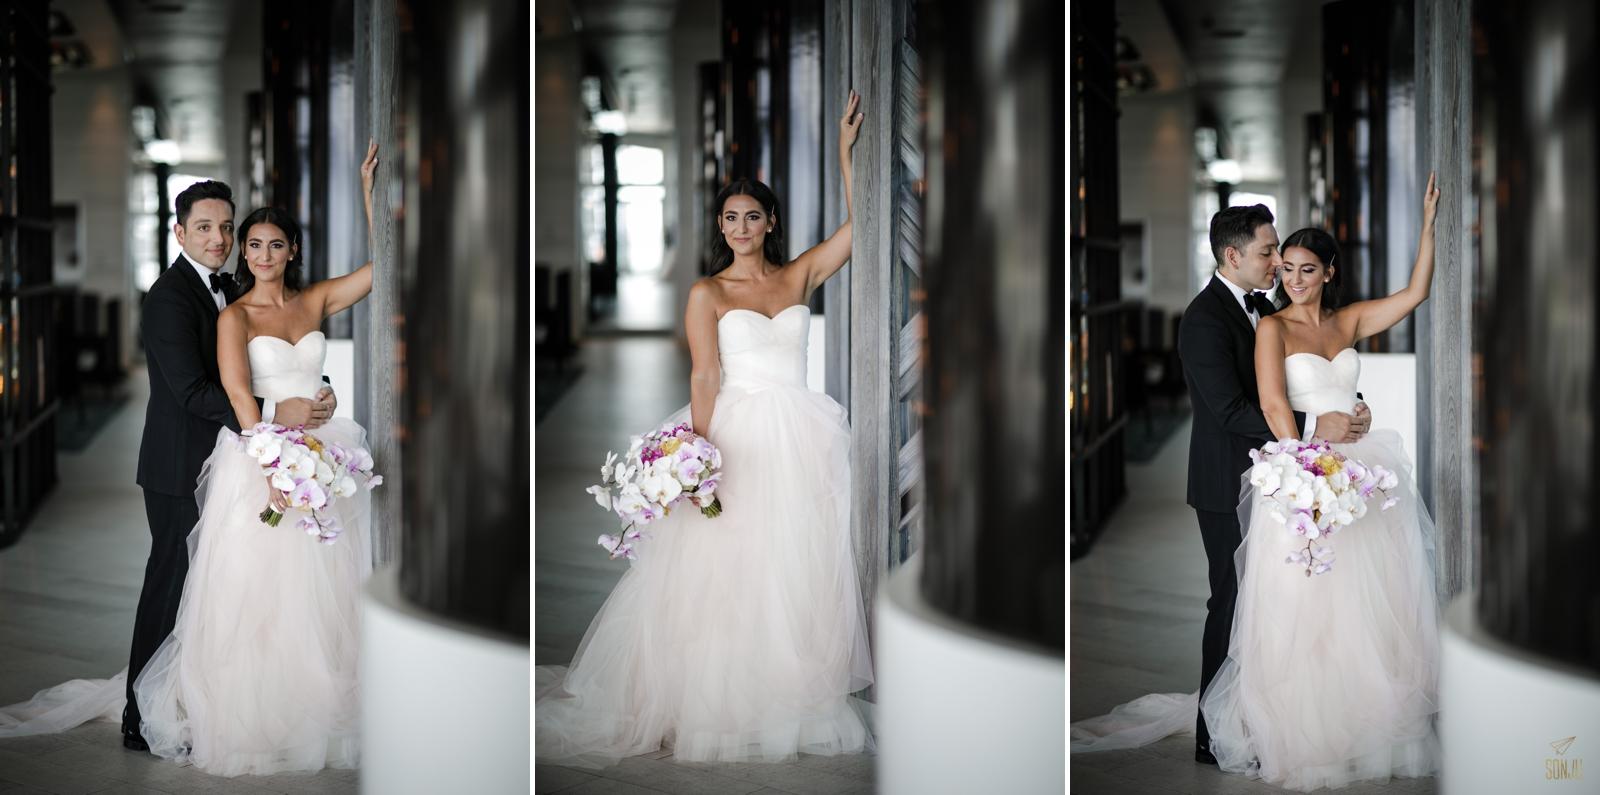 e033eda4591 Wedding Dresses Fort Lauderdale Fl - Gomes Weine AG